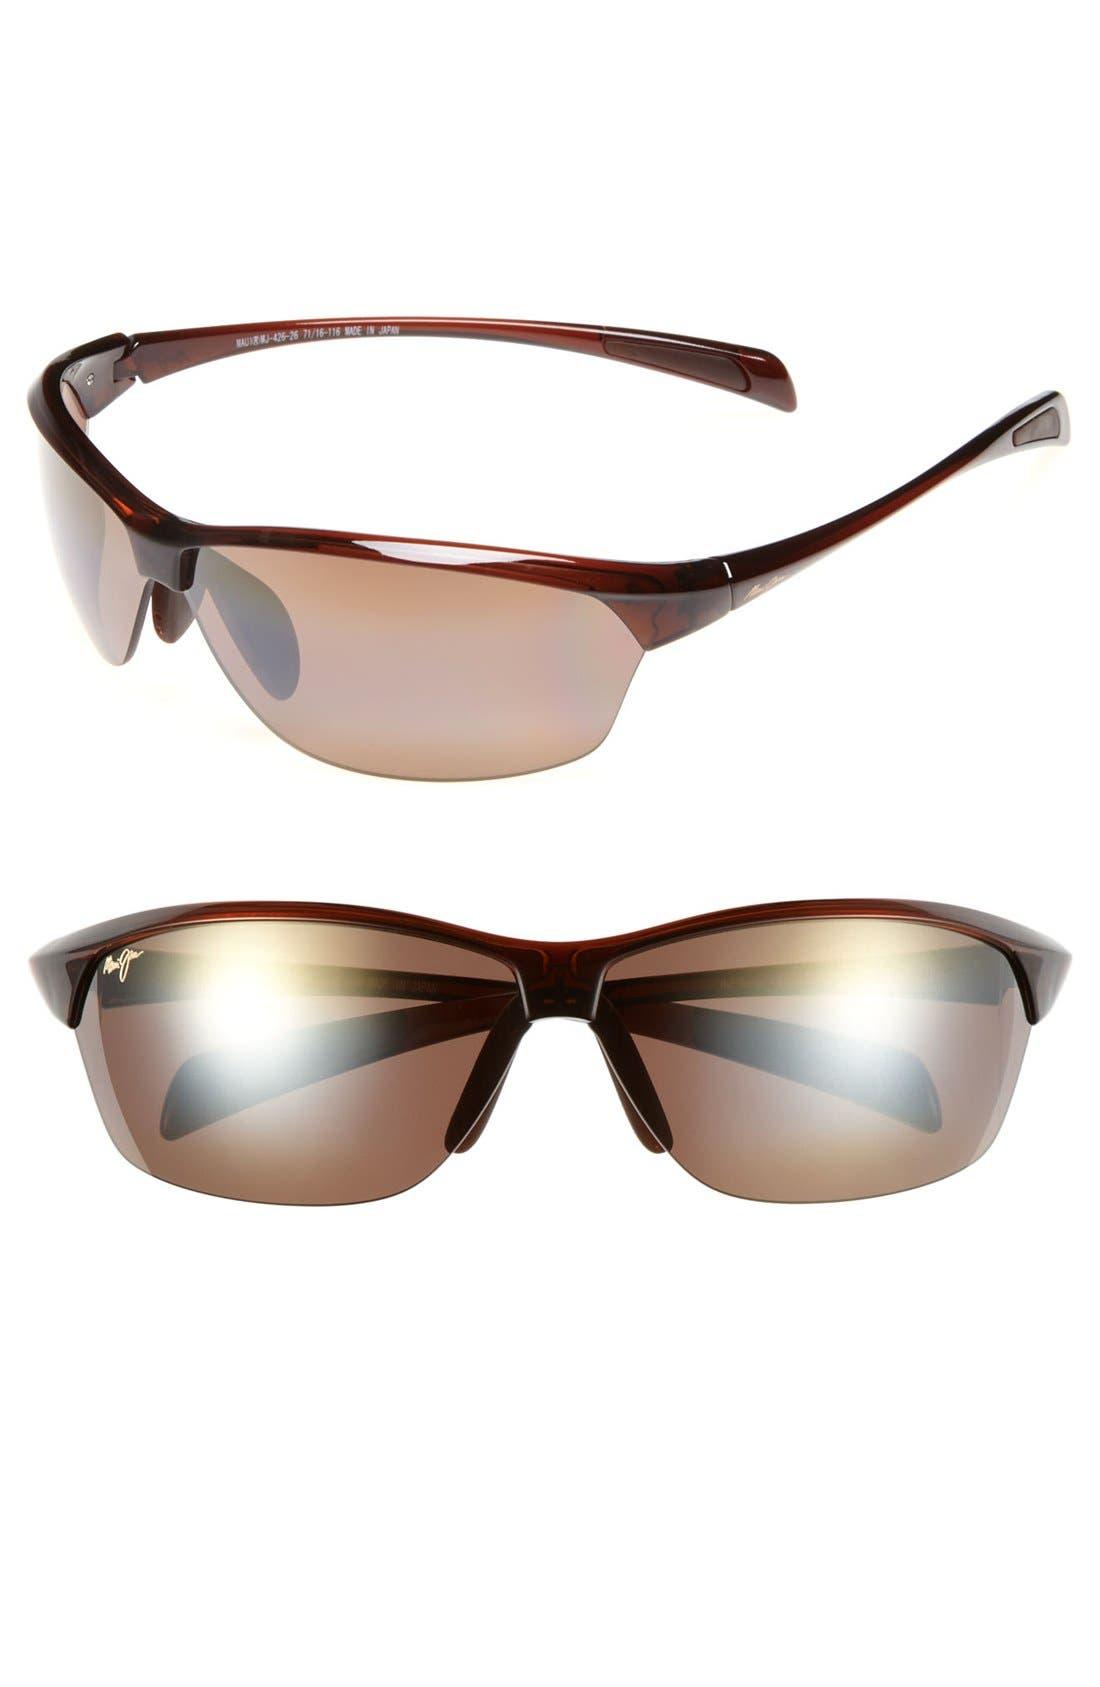 Main Image - Maui Jim Hot Sands 71mm PolarizedPlus2® Sunglasses